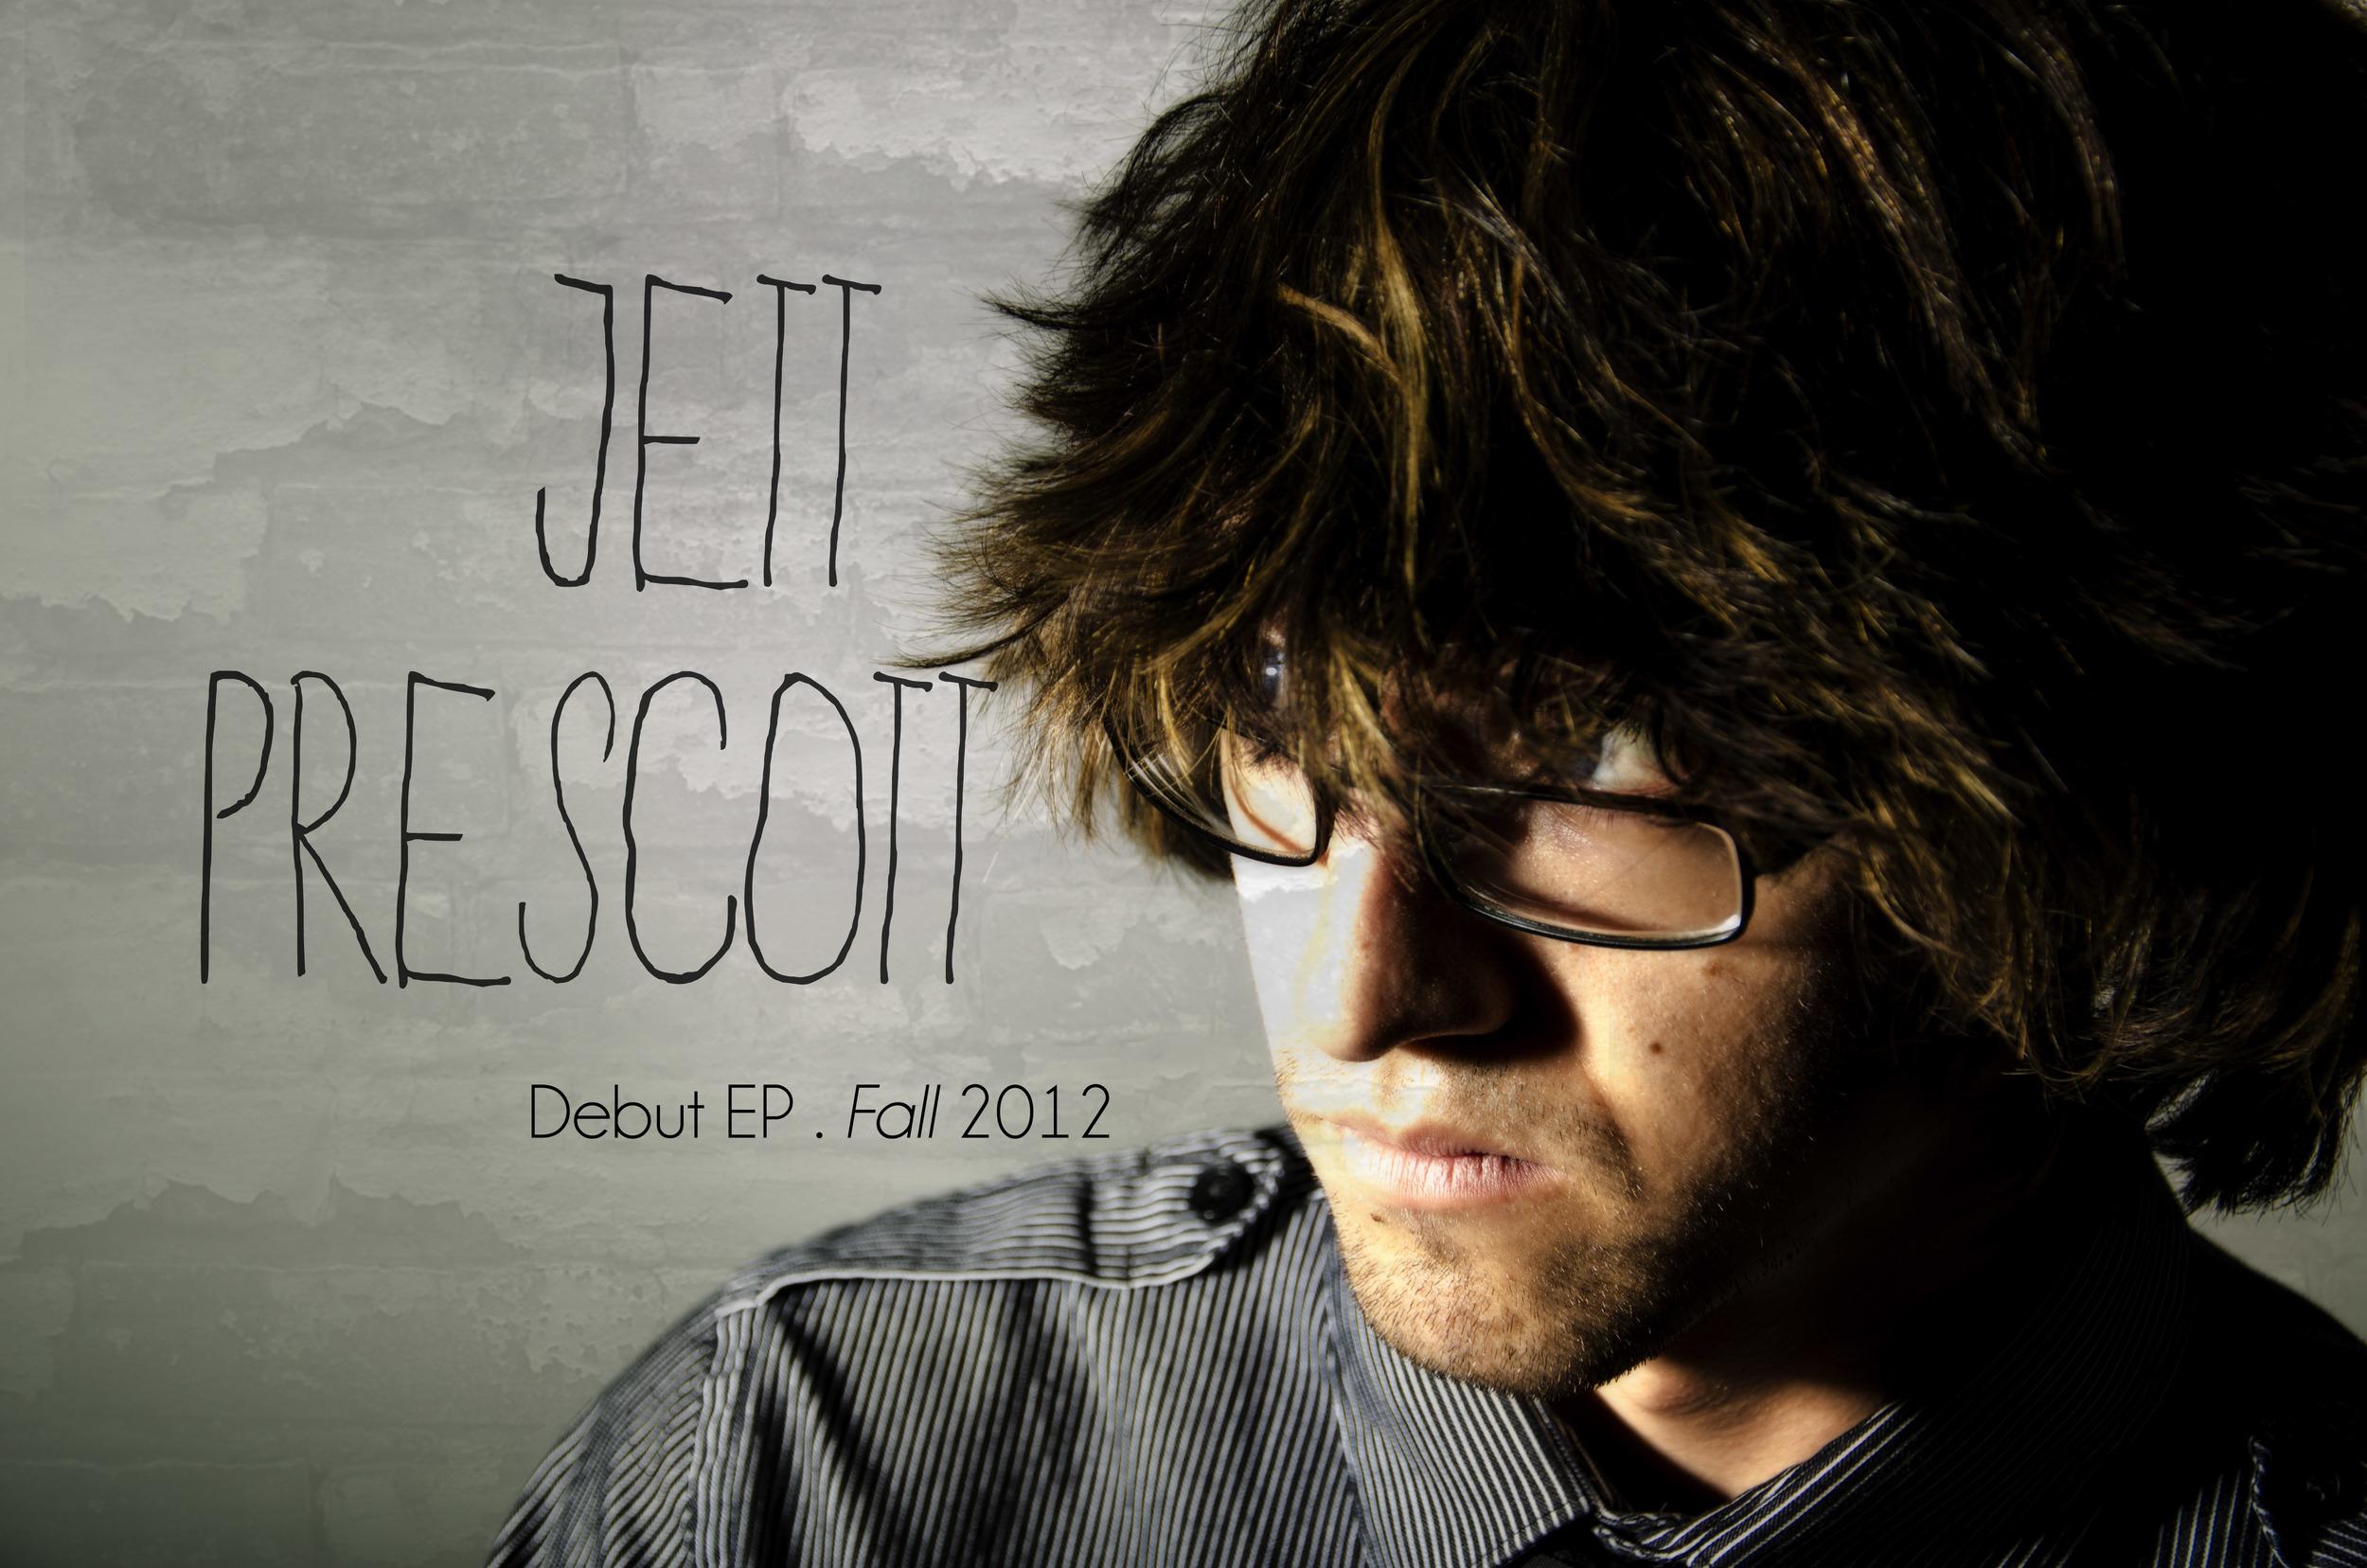 Facebook Banner - Jett Prescott